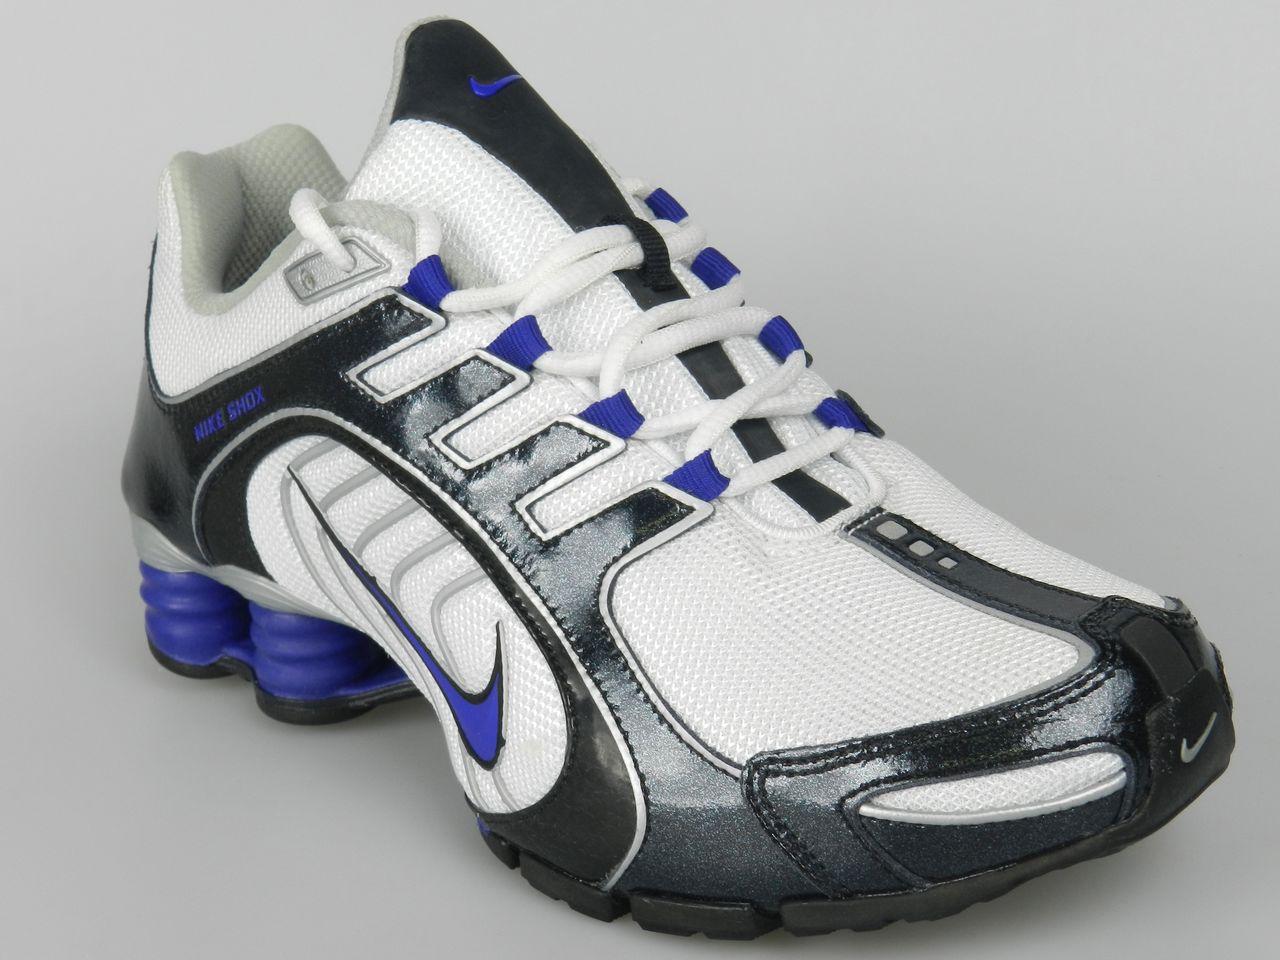 83e3a5a9908d White Nike Shox Women Glitter Sandals Nike Shox Women 7.5